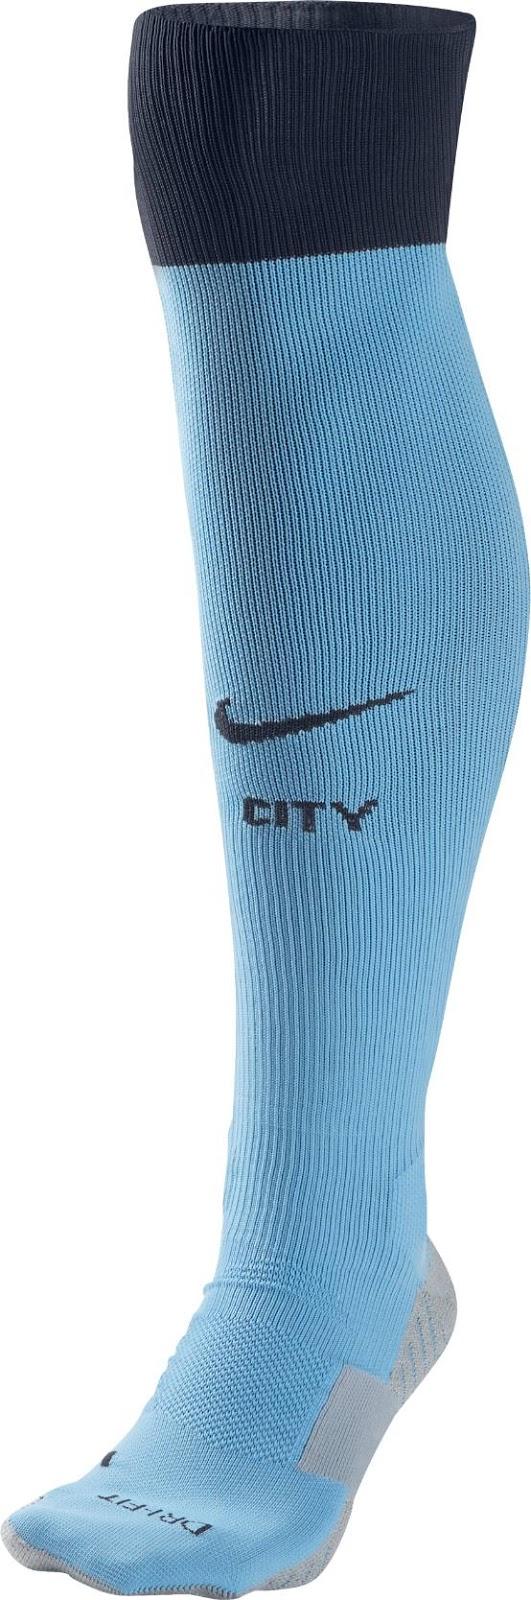 512x512 Nike Logo The Sponsor Logo And The Nike